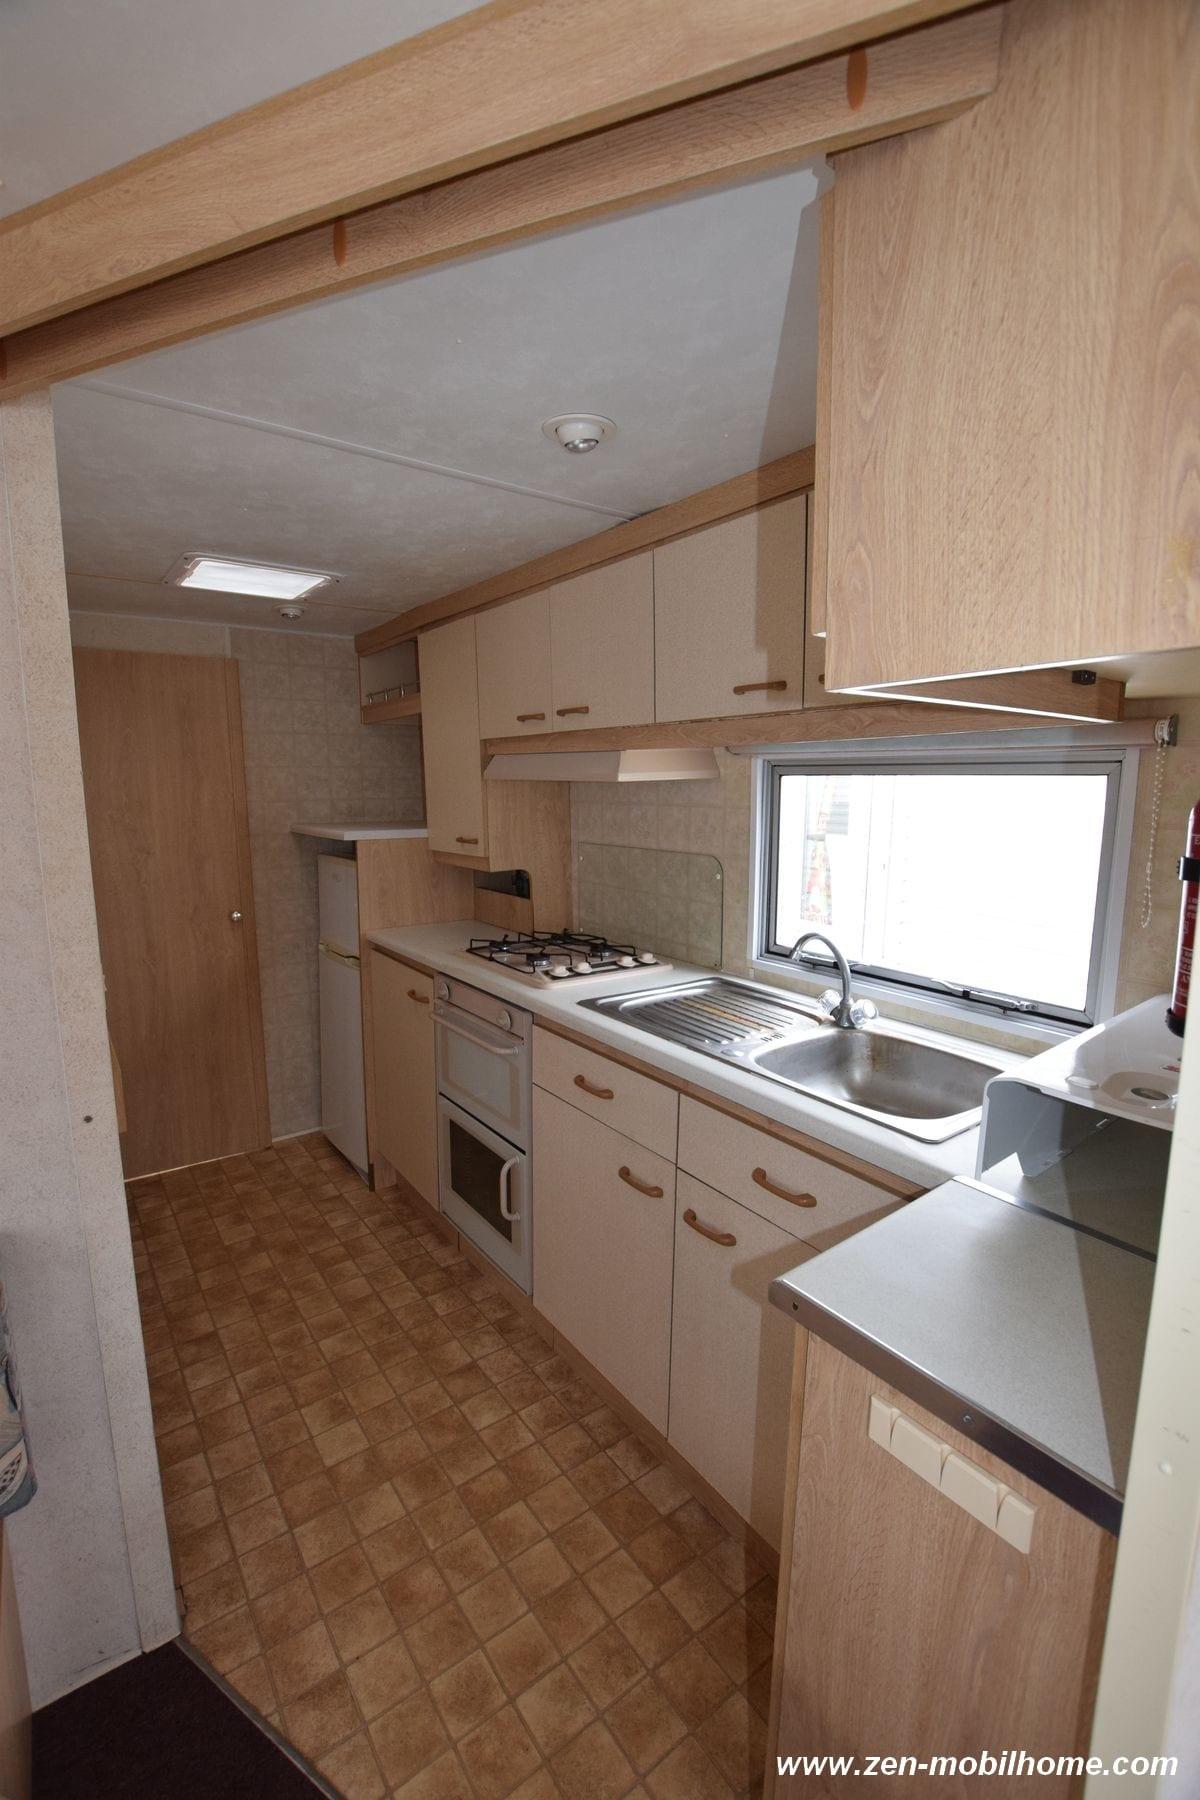 bk conquest mobil home d 39 occasion 3 500 zen mobil homes. Black Bedroom Furniture Sets. Home Design Ideas